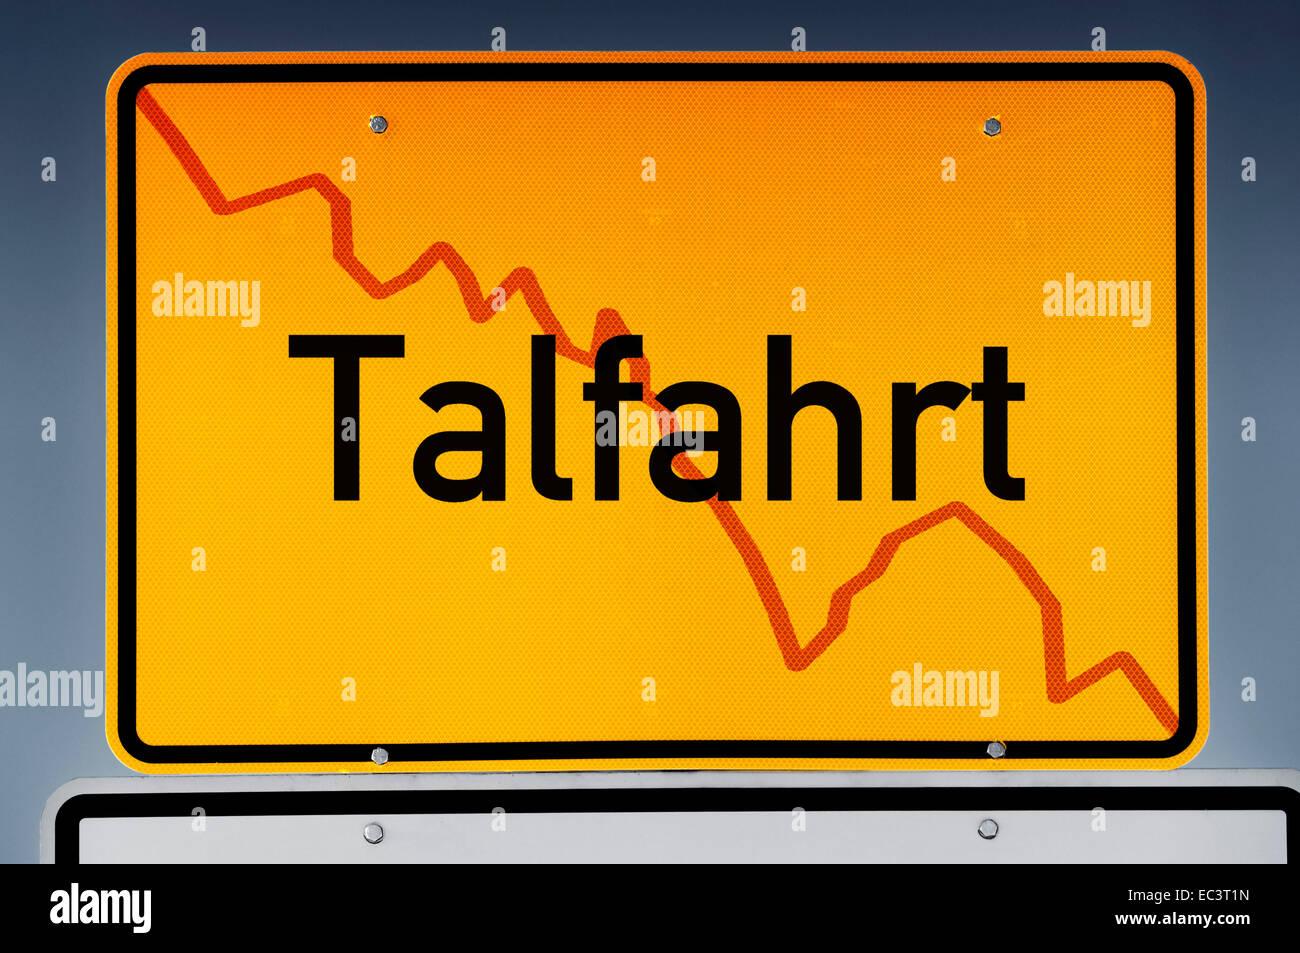 Place name sign, German lettering stock market crash Stock Photo